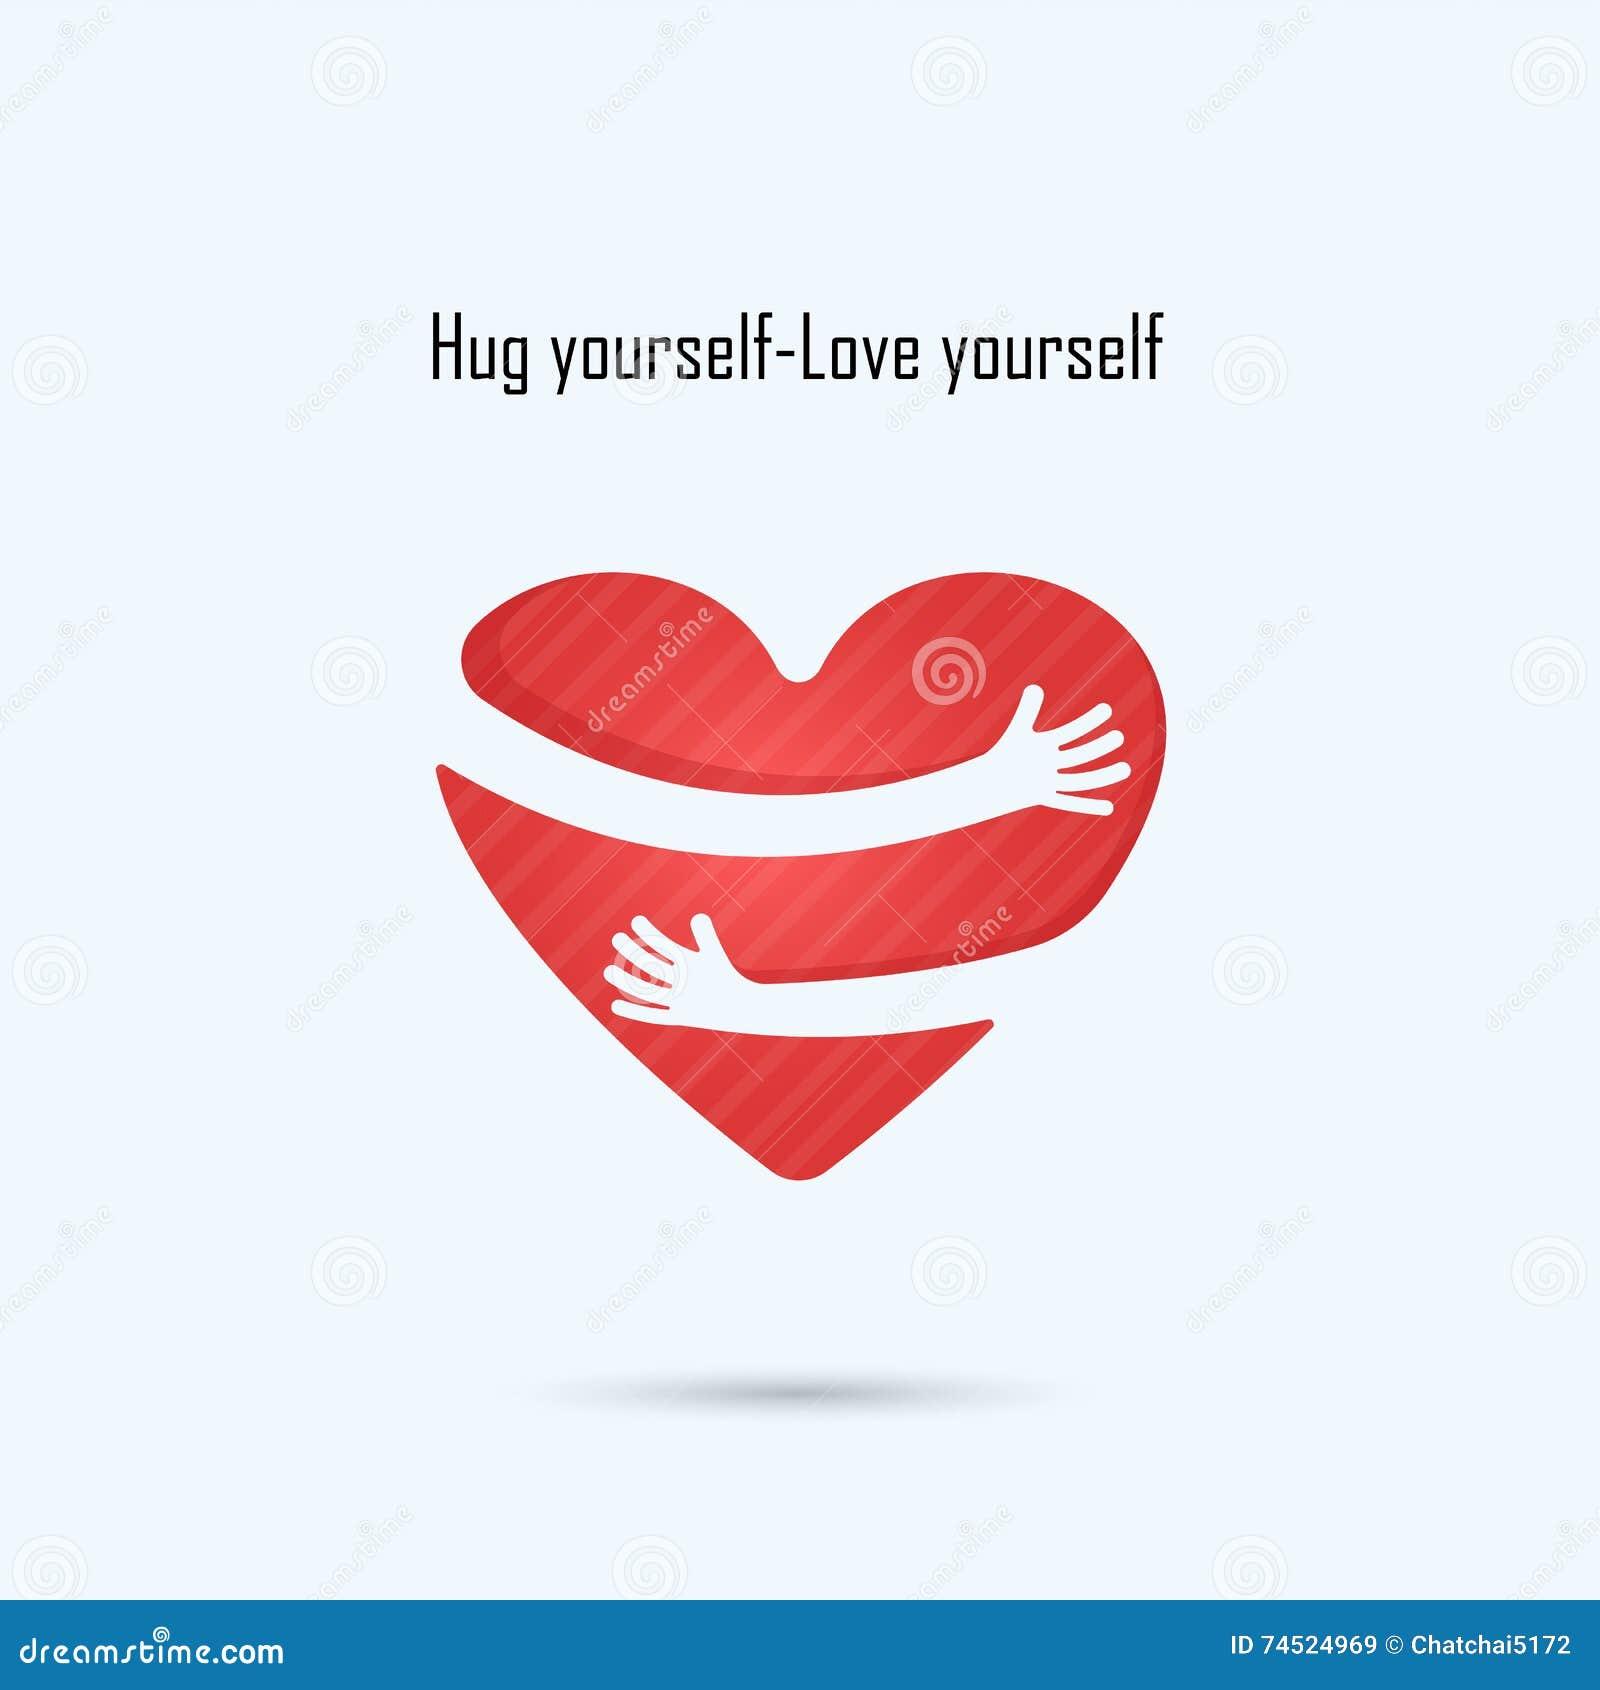 Hug Yourself Logo .Love Yourself Logo .Love And Heart Care